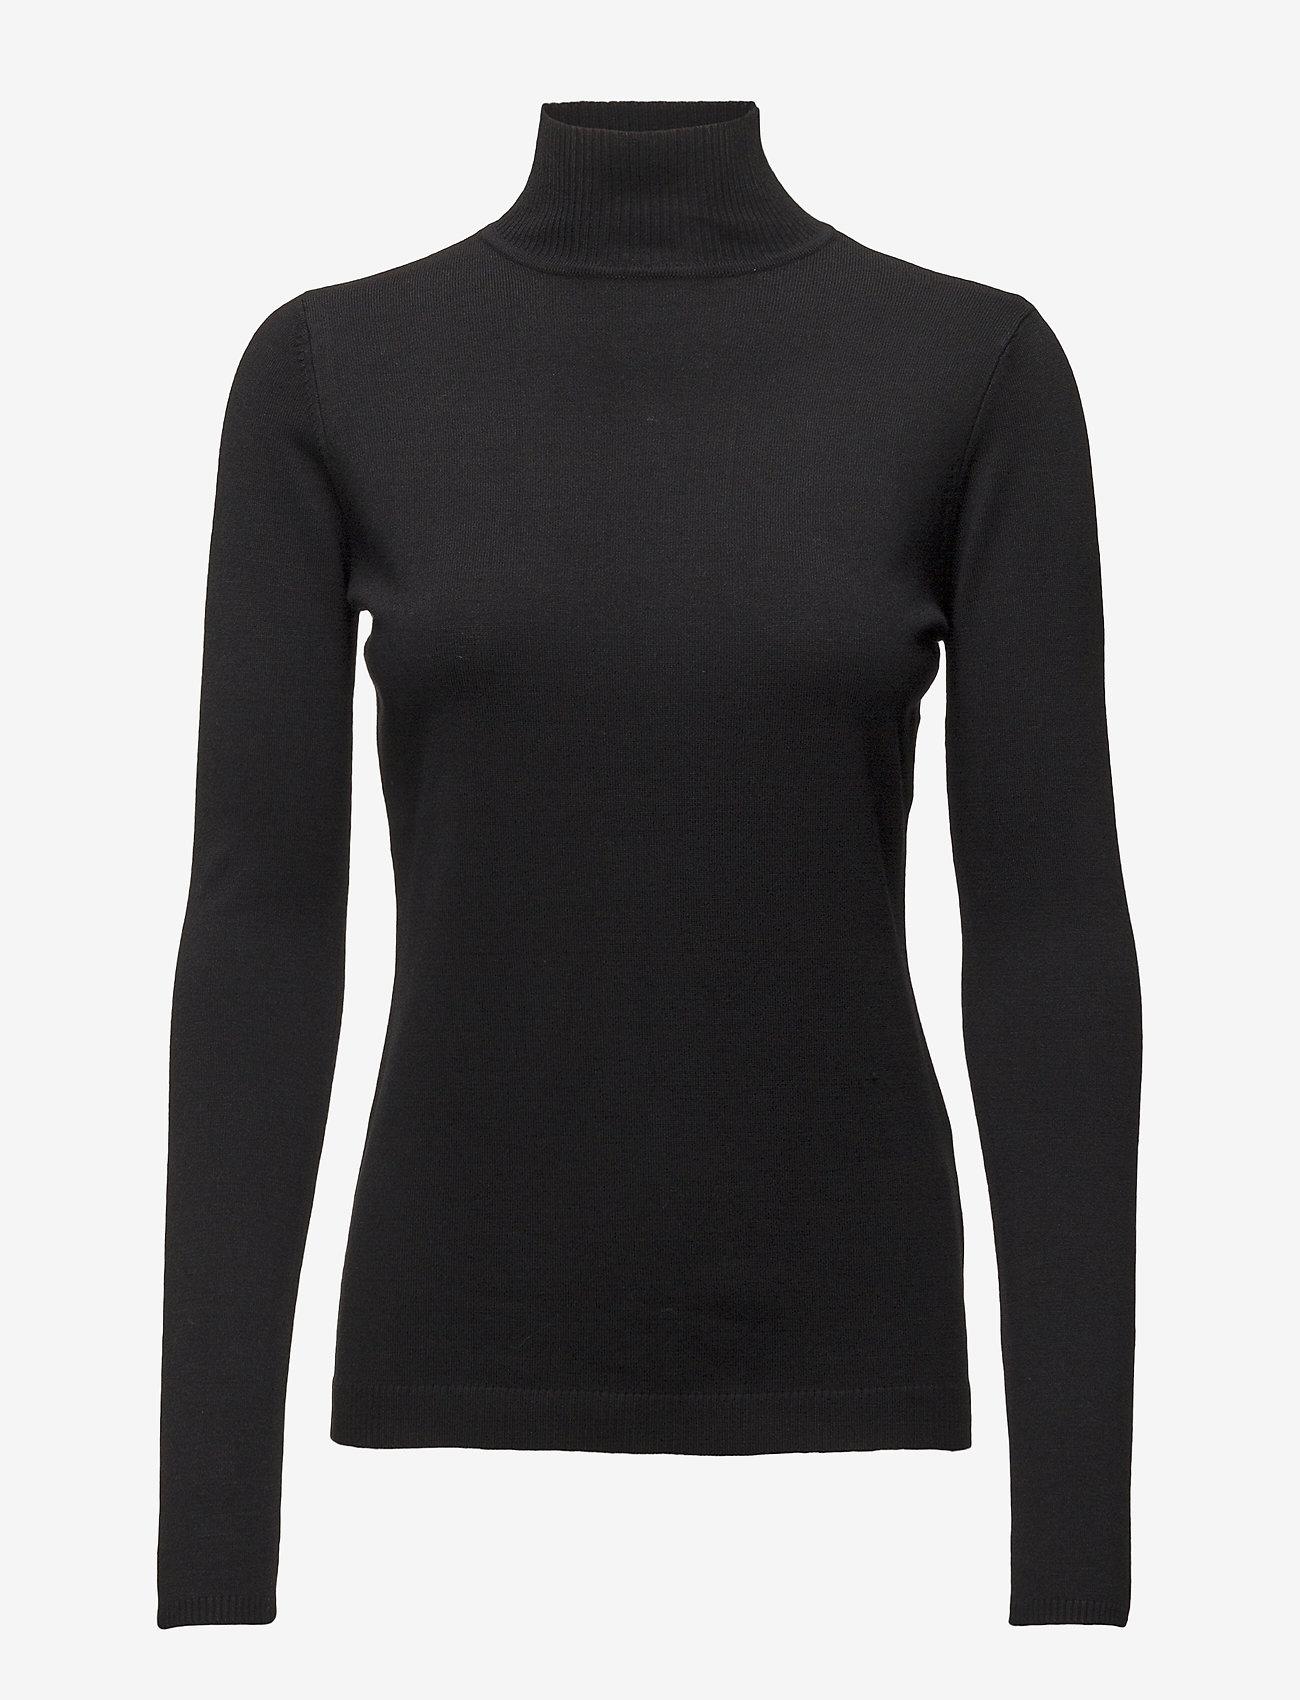 Minus - Lana roll neck knit - turtlenecks - black - 0